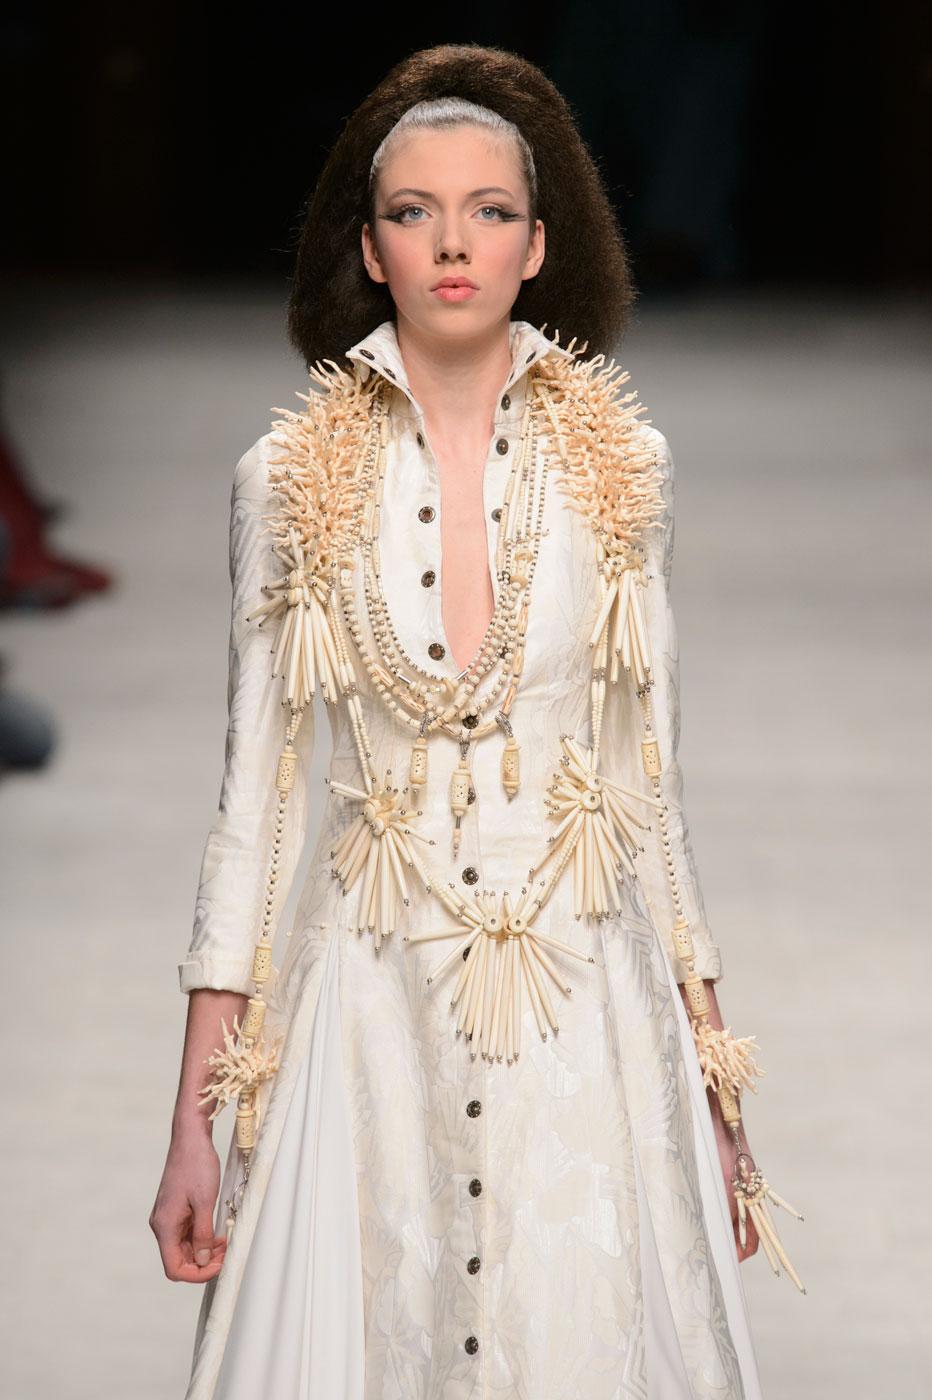 Julien-Fournie-Prive-fashion-runway-show-haute-couture-paris-spring-2015-the-impression-57